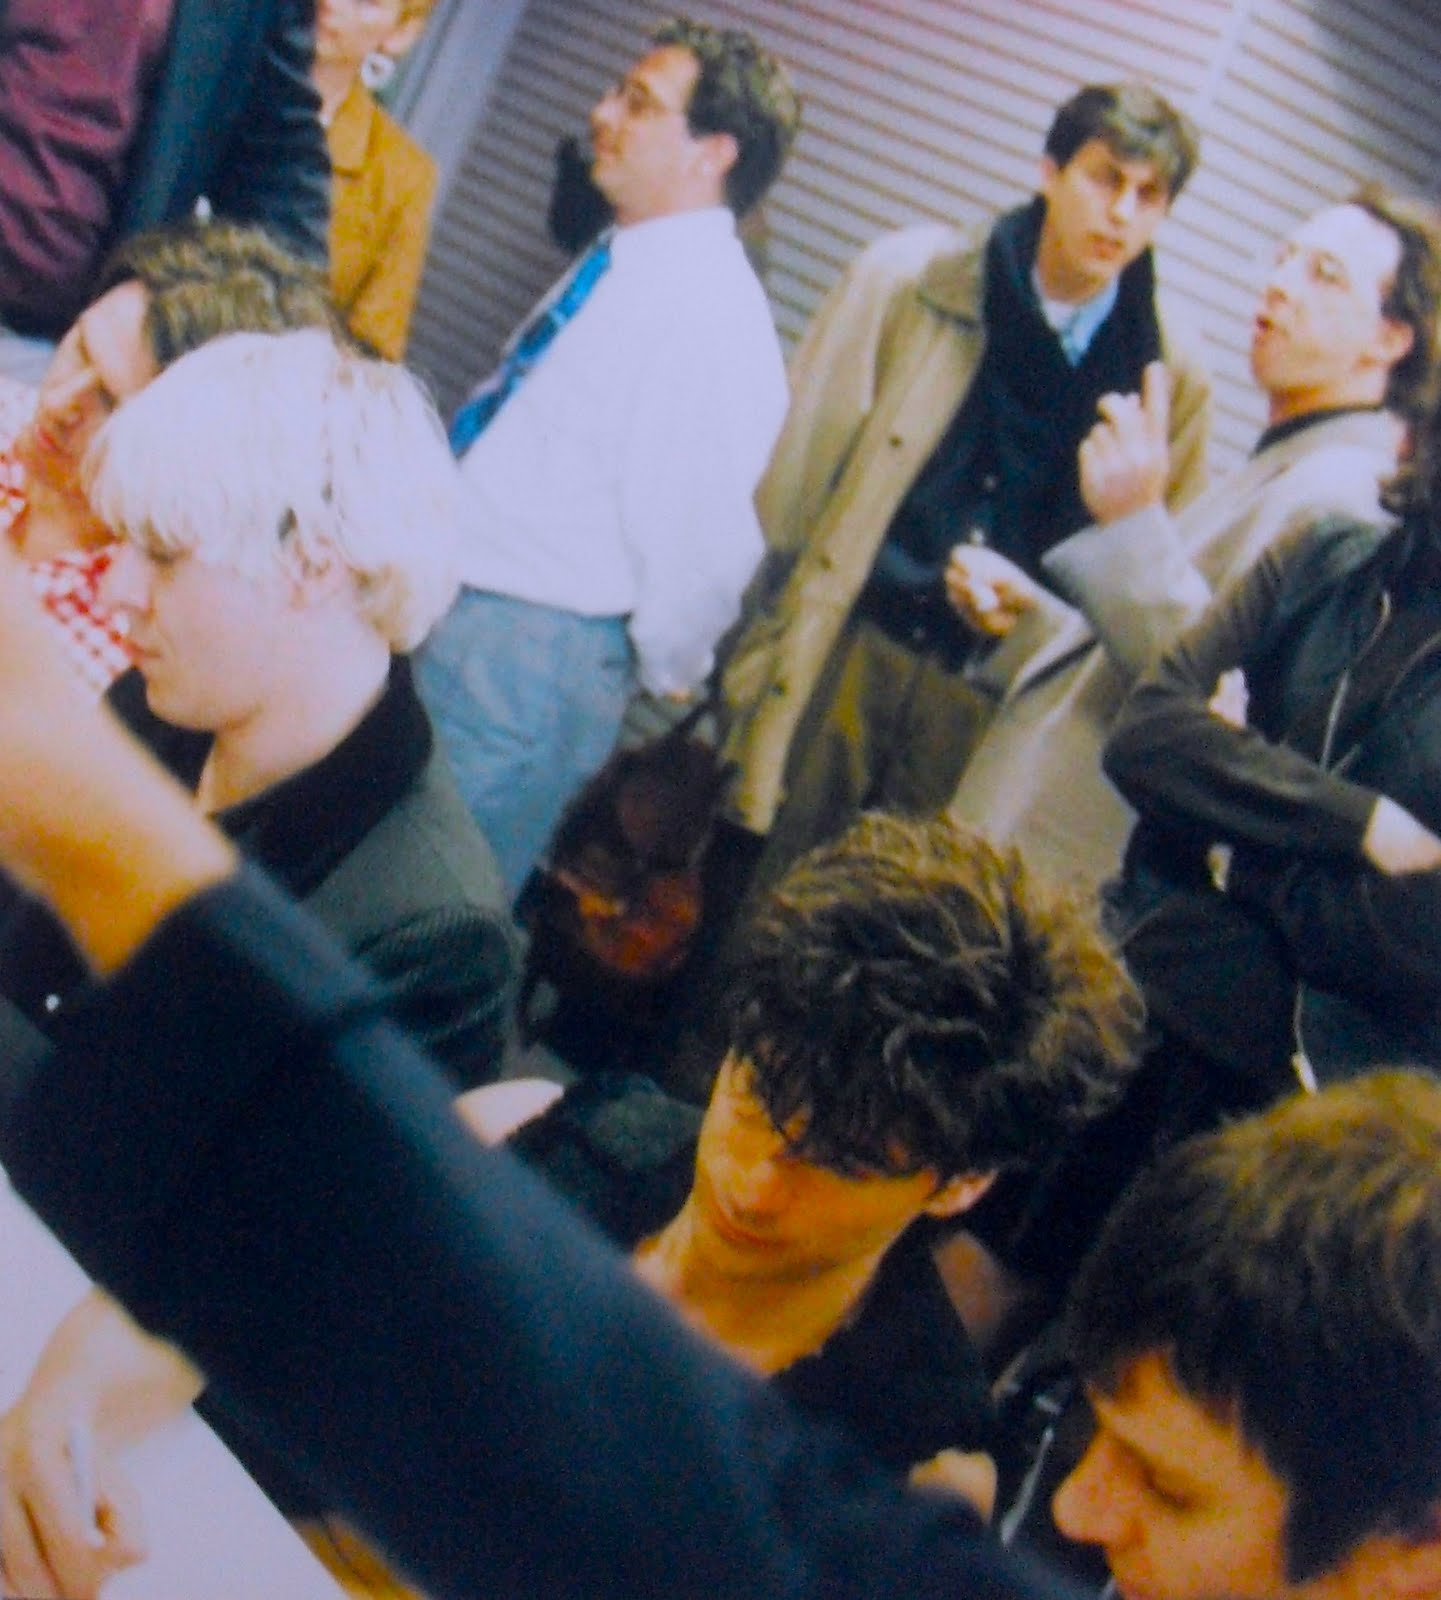 http://2.bp.blogspot.com/-aGaxXw92w8g/TeAEHZ_lHrI/AAAAAAAAEO8/BcyiLSMYrQQ/s1600/Duran+Duran+1995+Sam+Goody+In+Store+Appearance+NYC+5.JPG